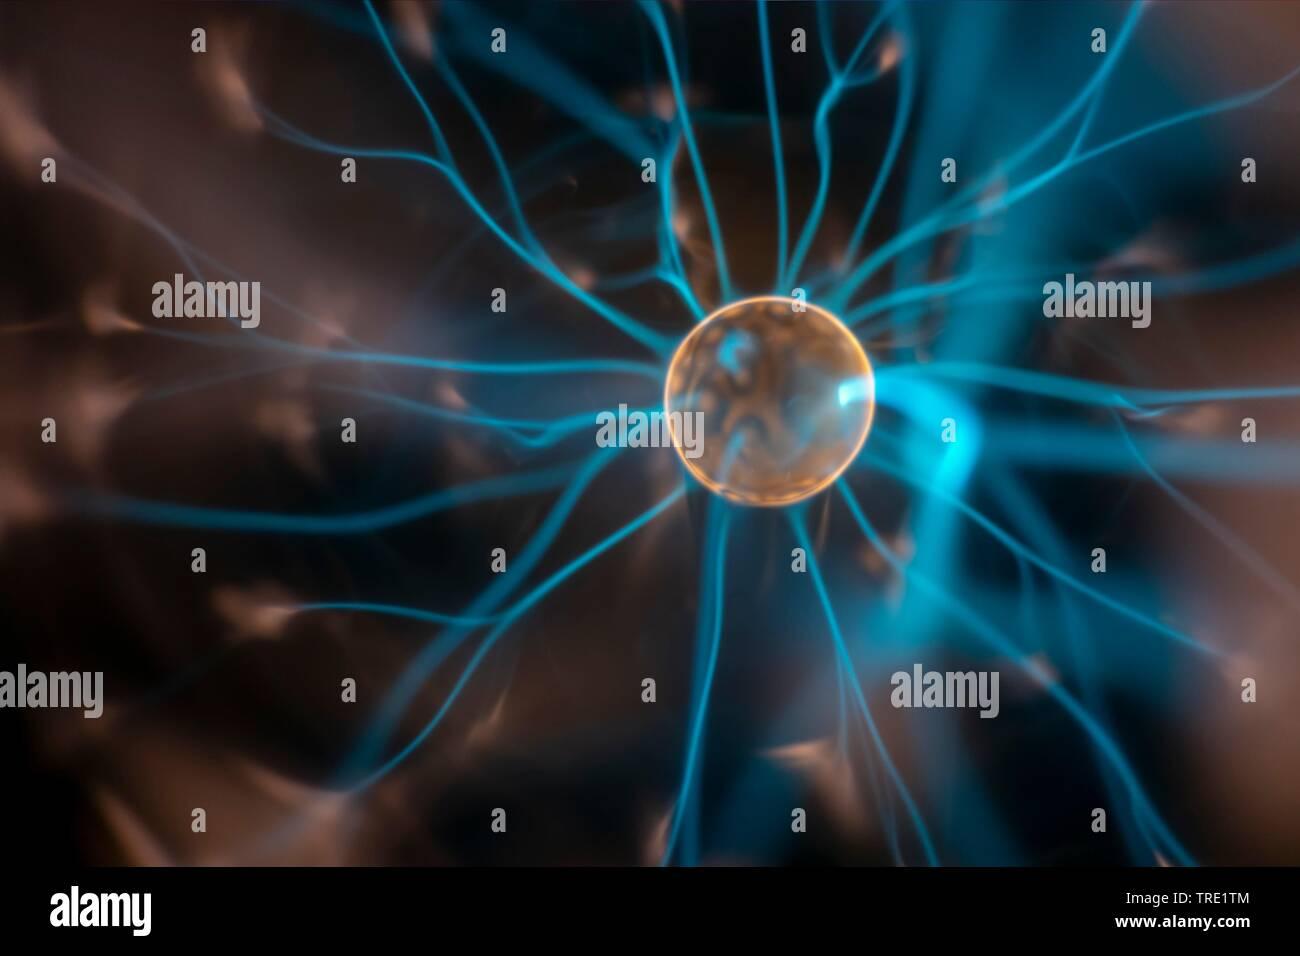 Plasmalampe mit elektrischer Entladung   plasma lamp with moving light beams   BLWS514903.jpg [ (c) blickwinkel/McPHOTO/M. Gann Tel. +49 (0)2302-27932 - Stock Image